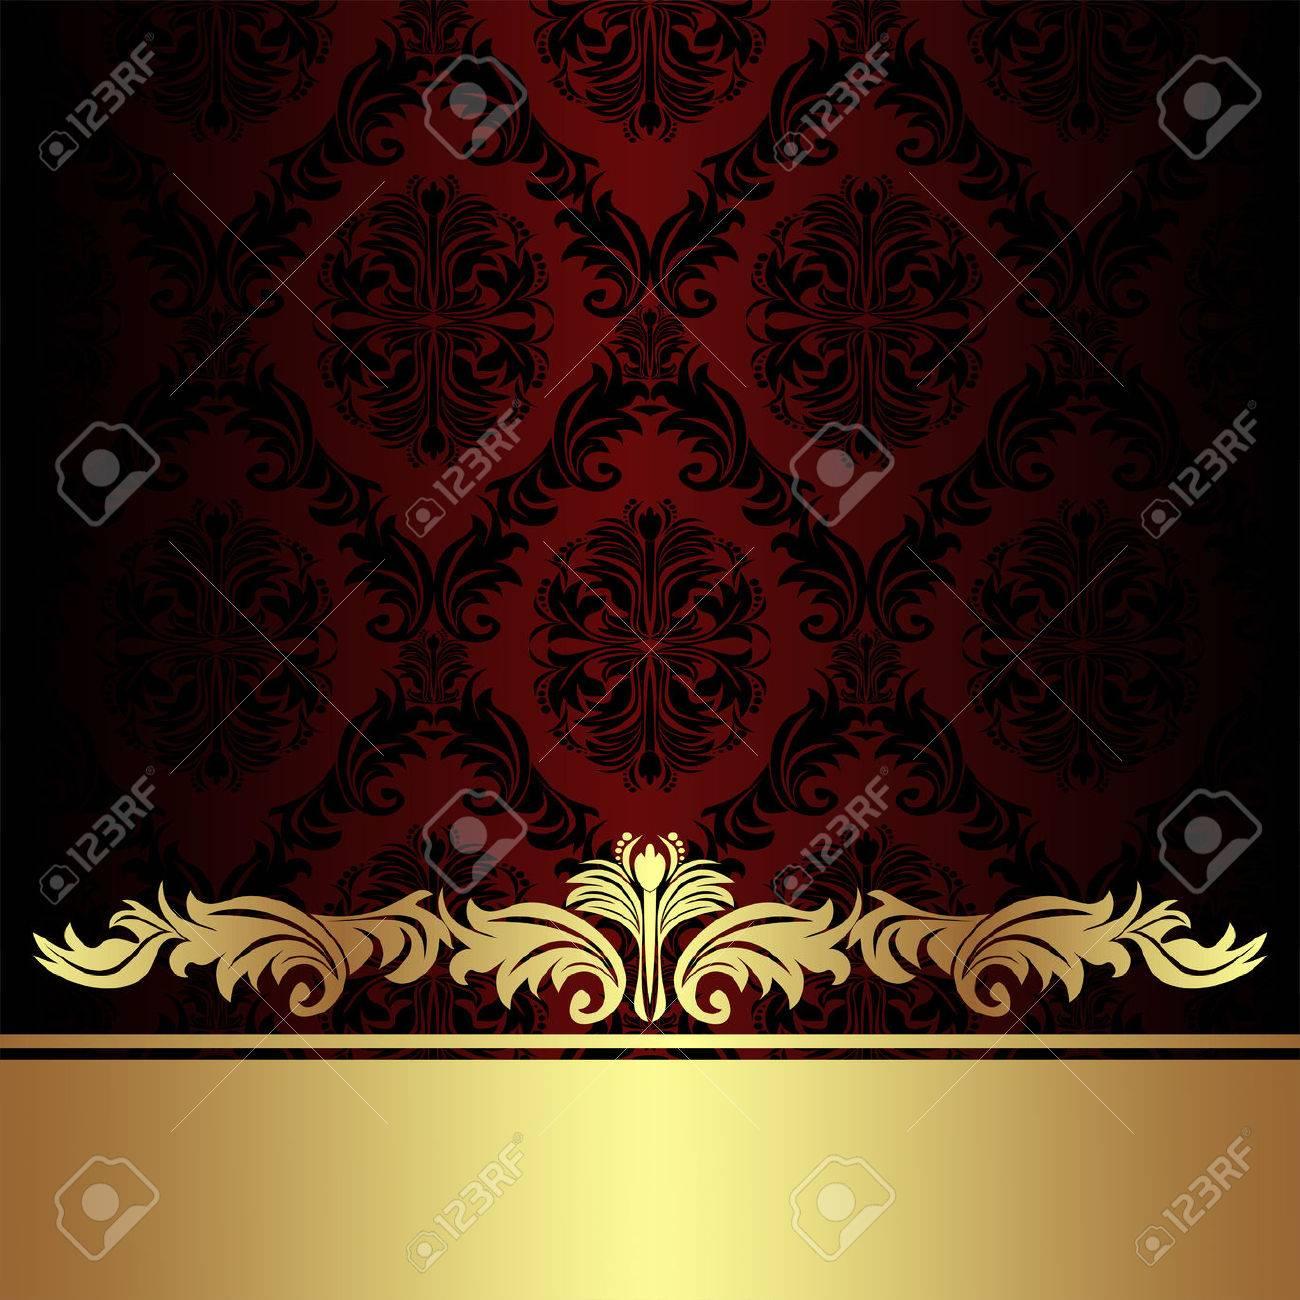 Damask red ornamental Background with golden royal Border. - 41201047